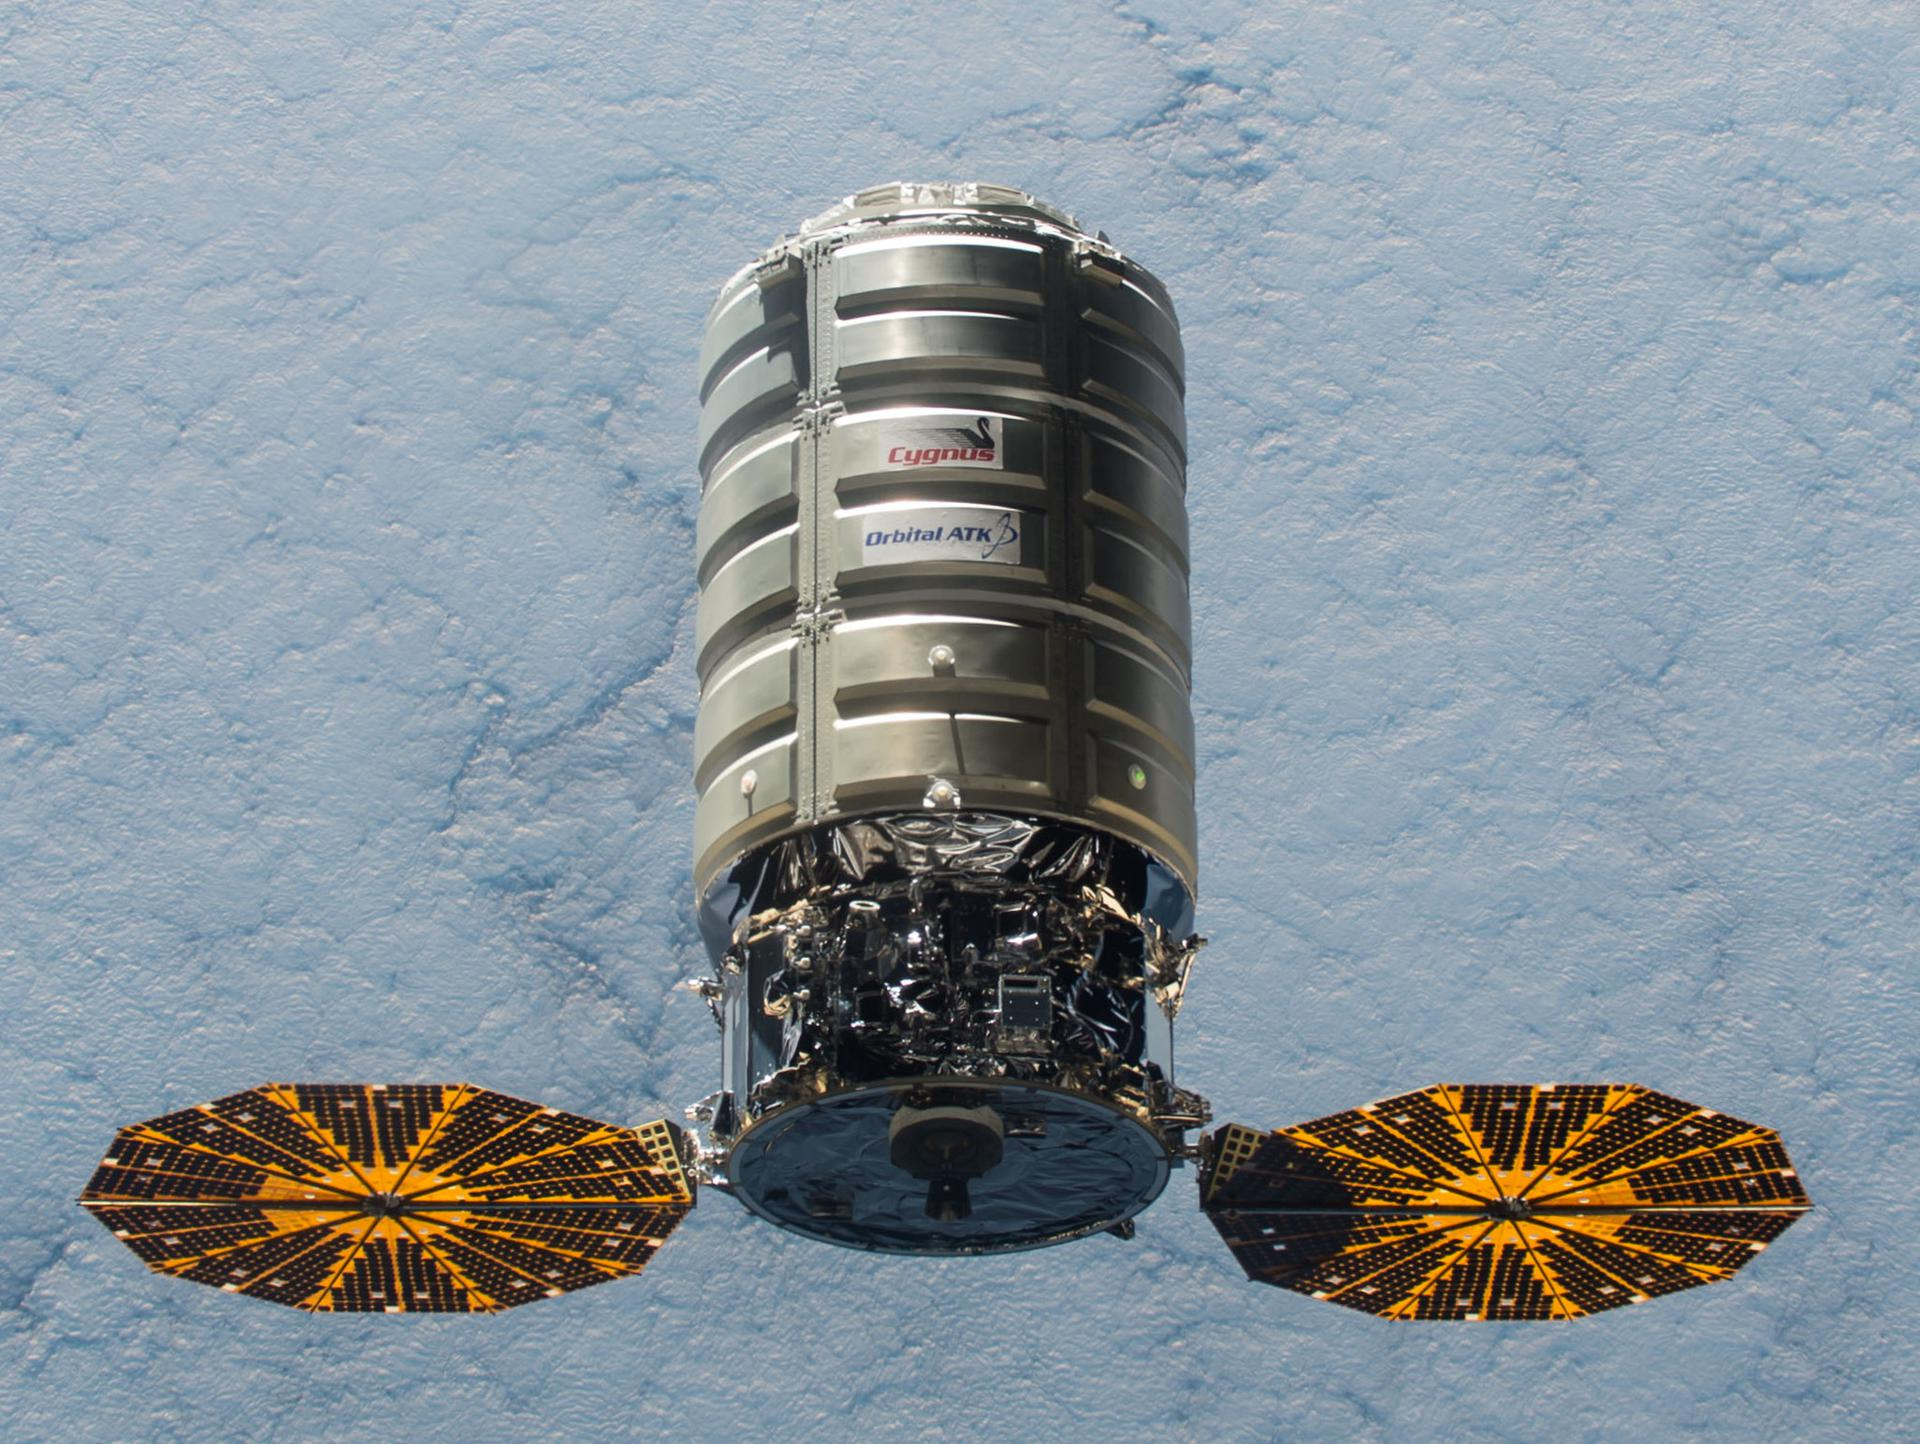 image of Cygnus Enhanced